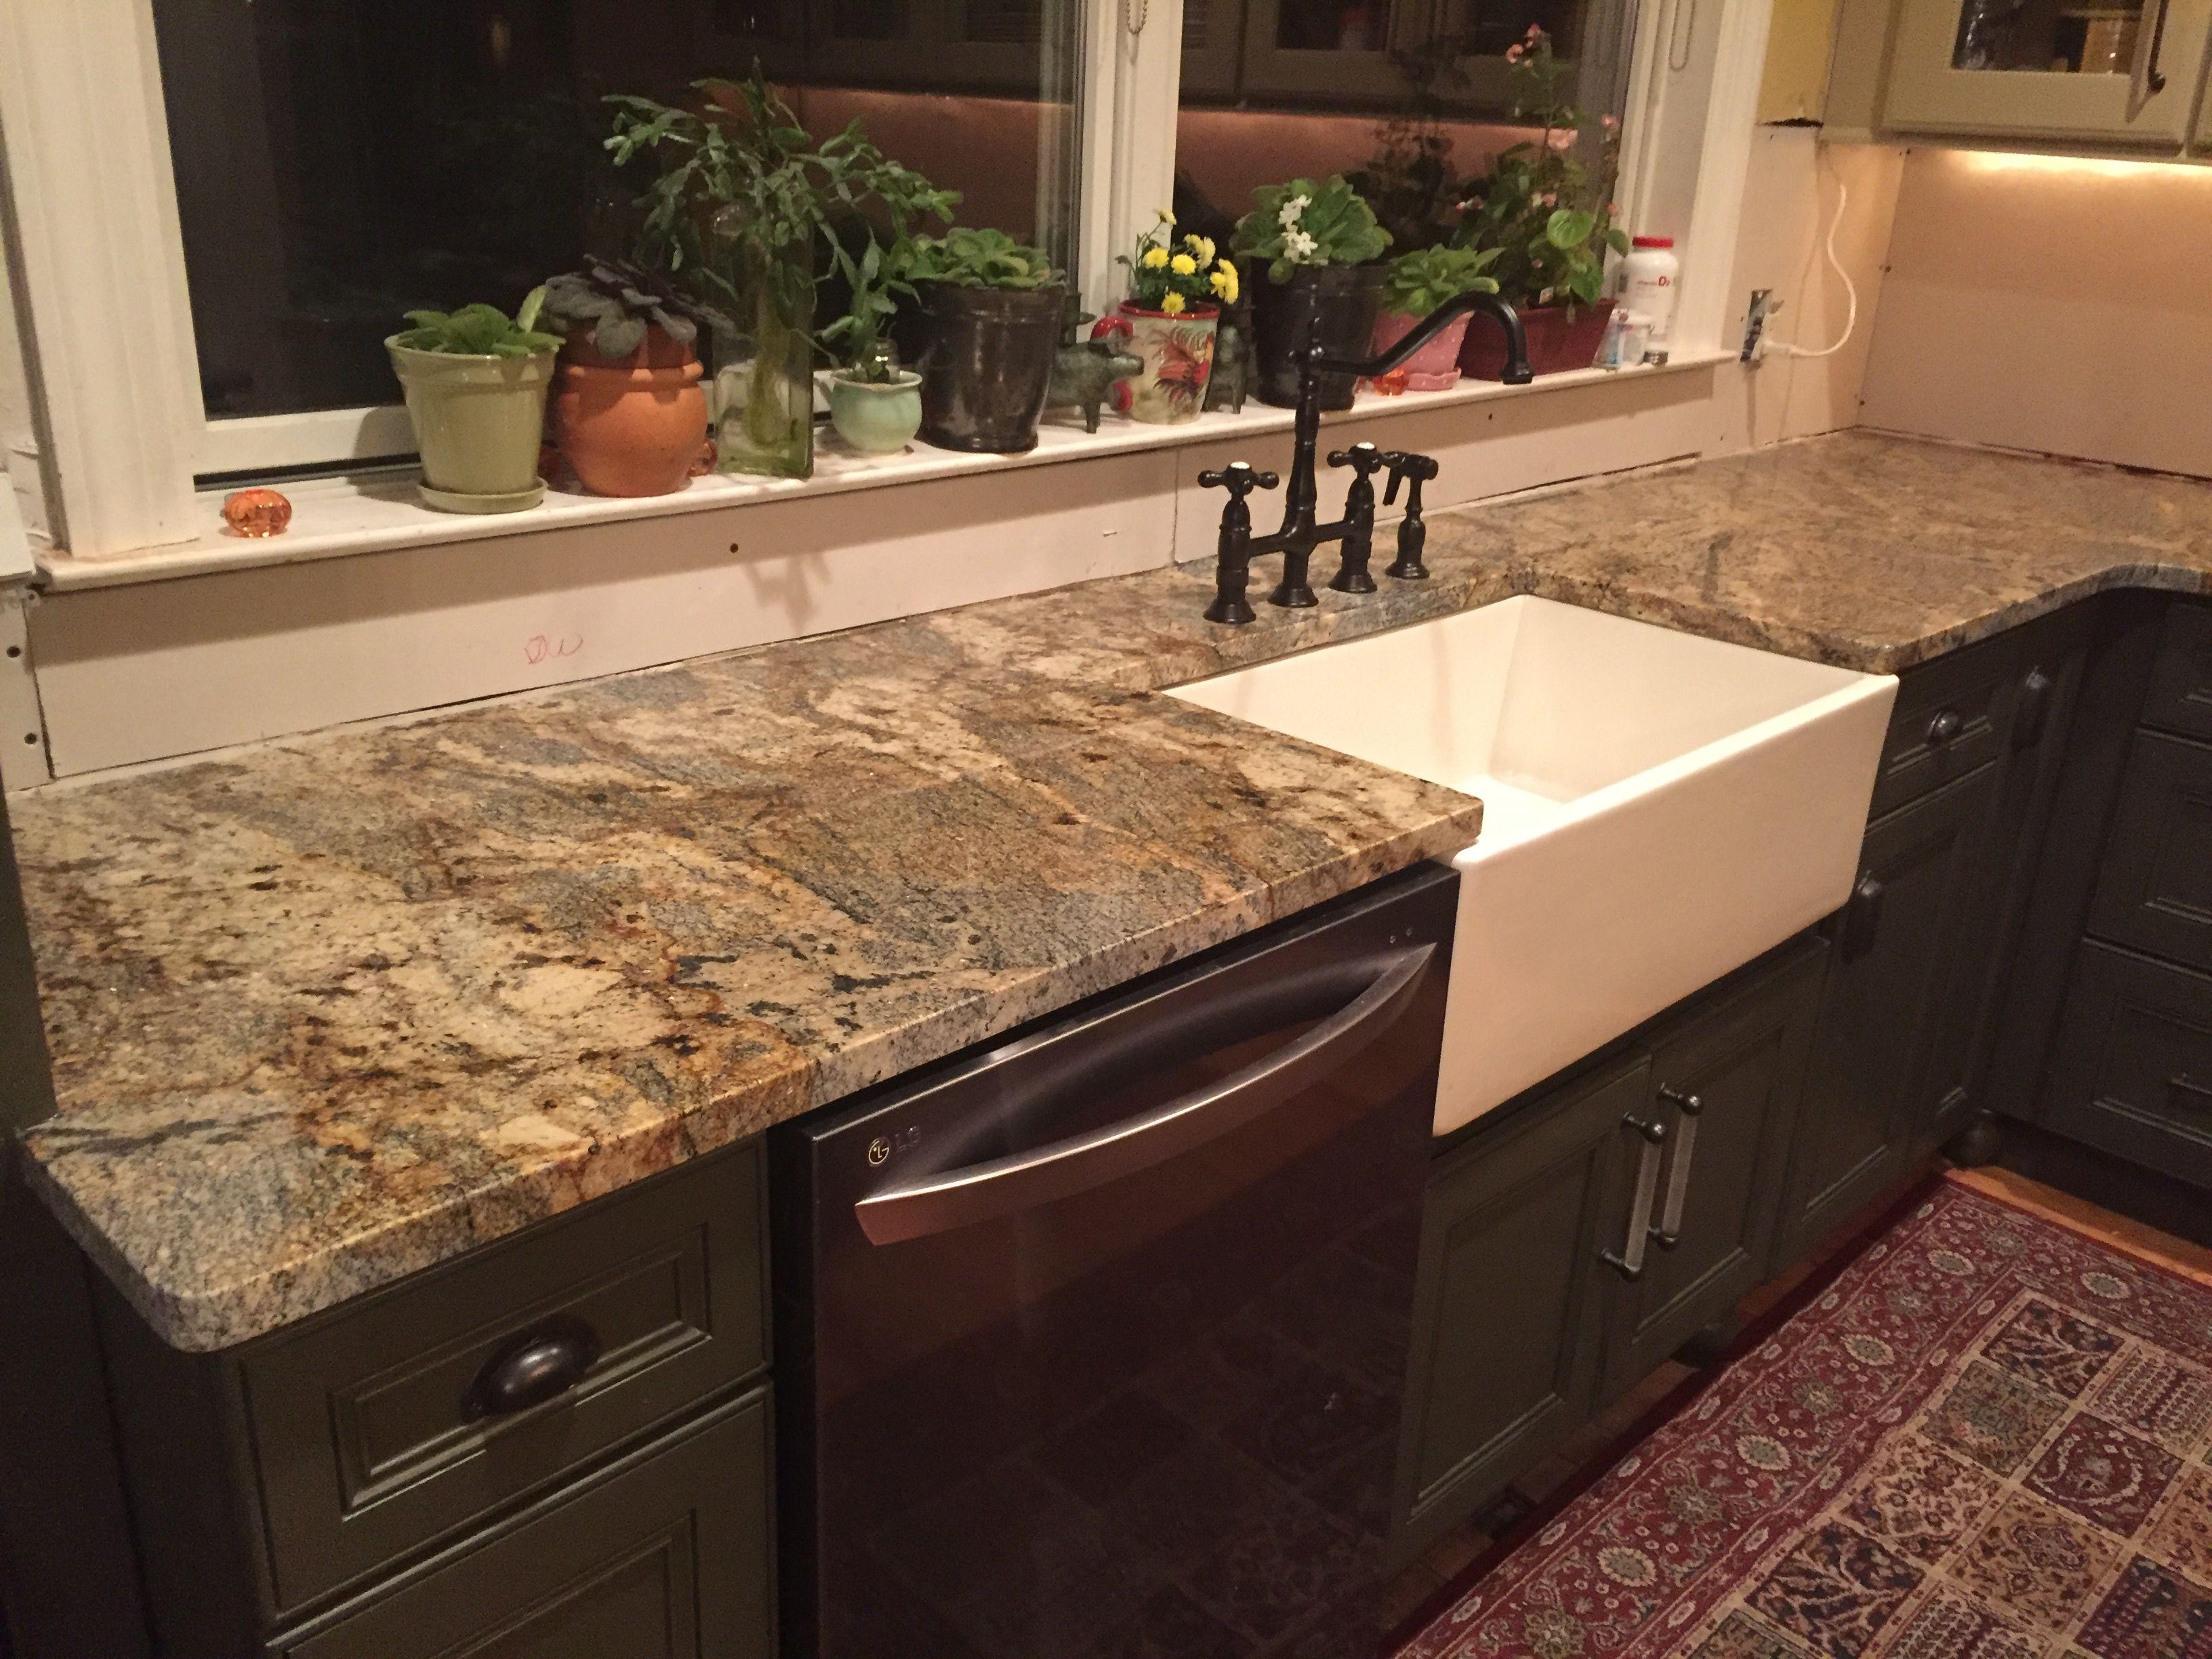 New Granite Countertop Lapidus Gold Lowe S Sensa Lowes Lapidusgold Granite It Is A Cheap Granite Countertops New Kitchen Cabinets Kitchen Cupboard Designs